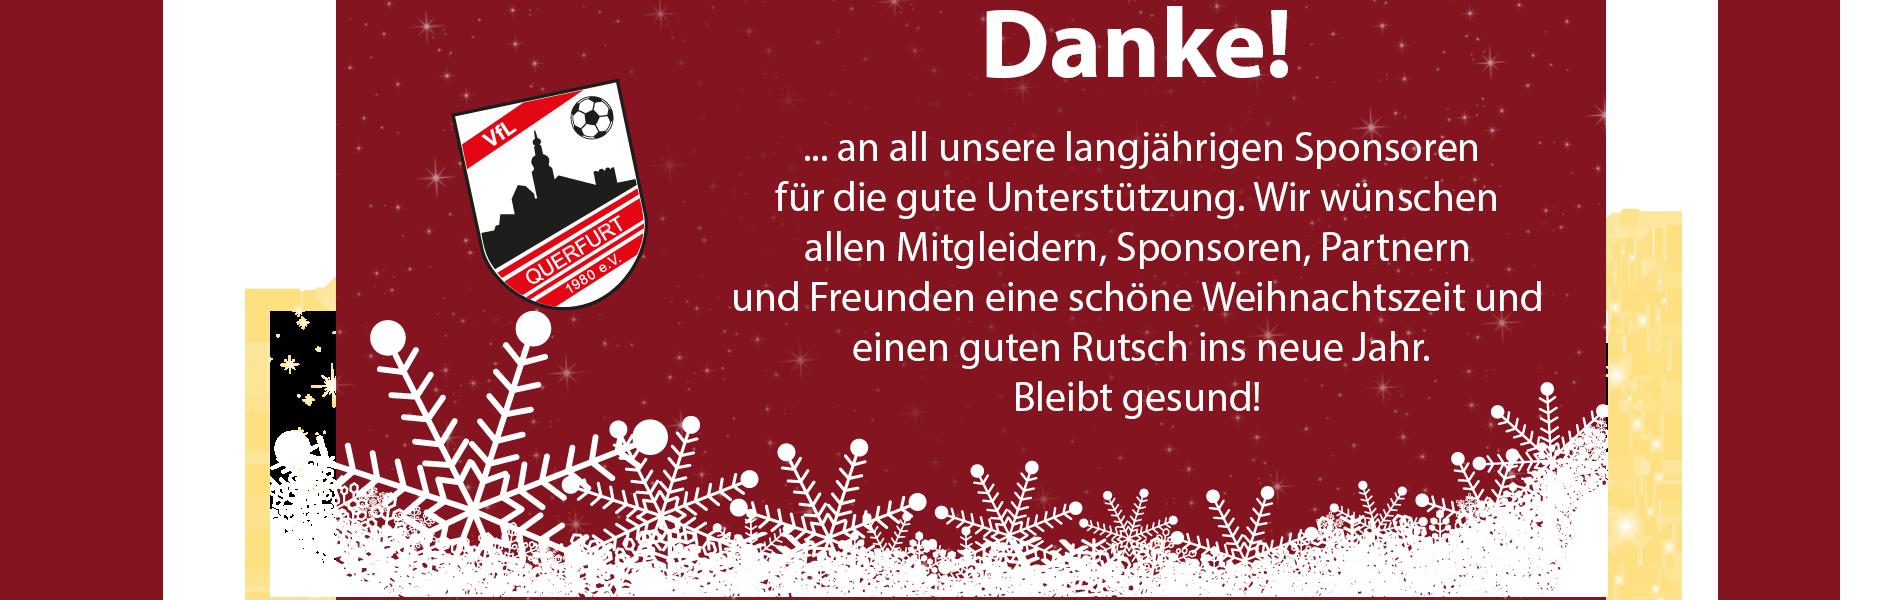 Weihnachtsgruss_web02